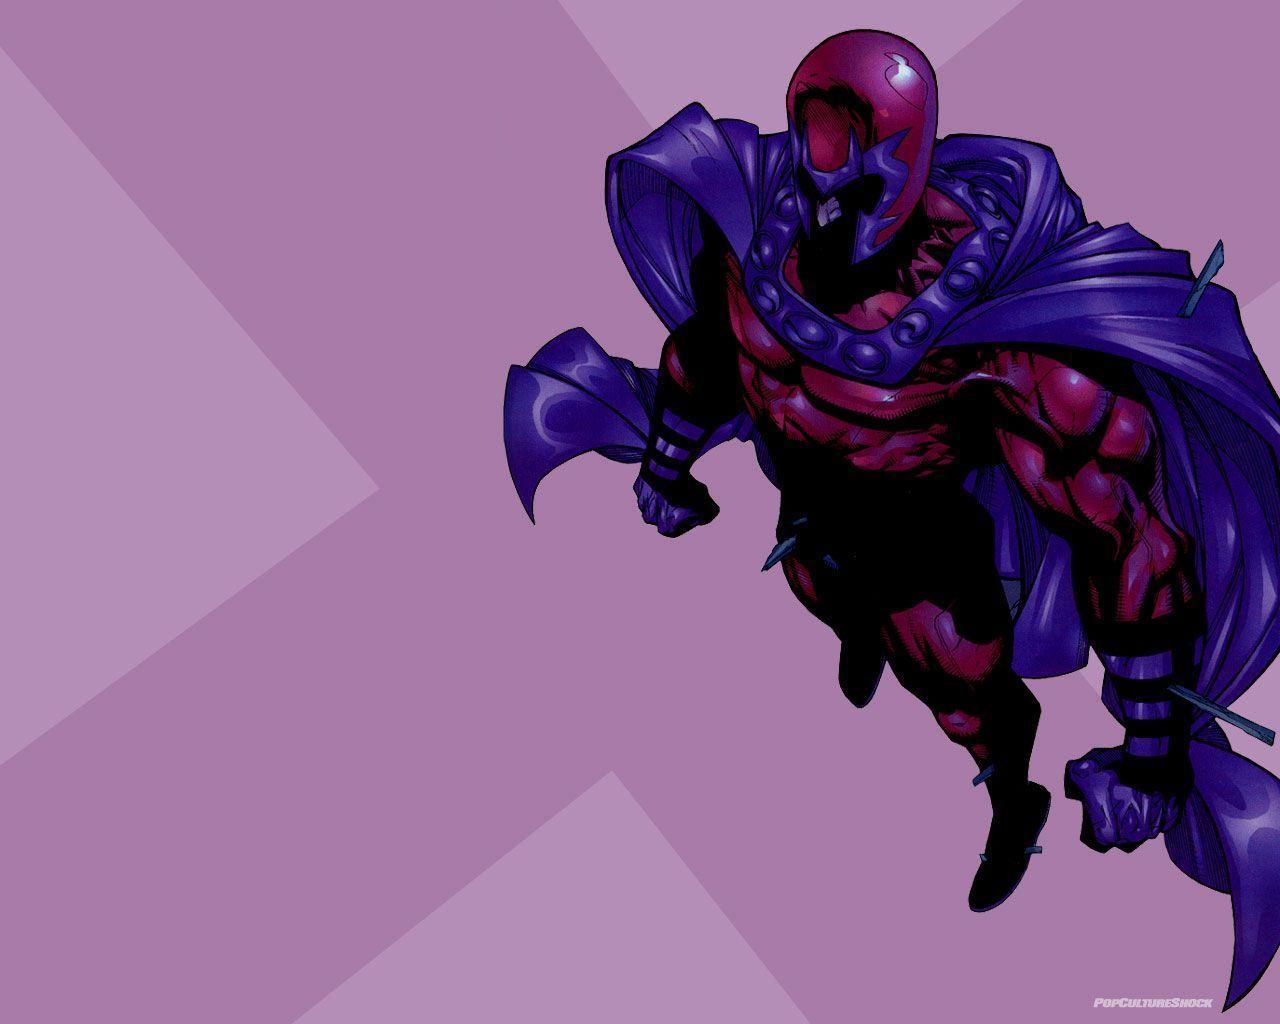 Download X Men Magneto Wallpaper 1280x1024